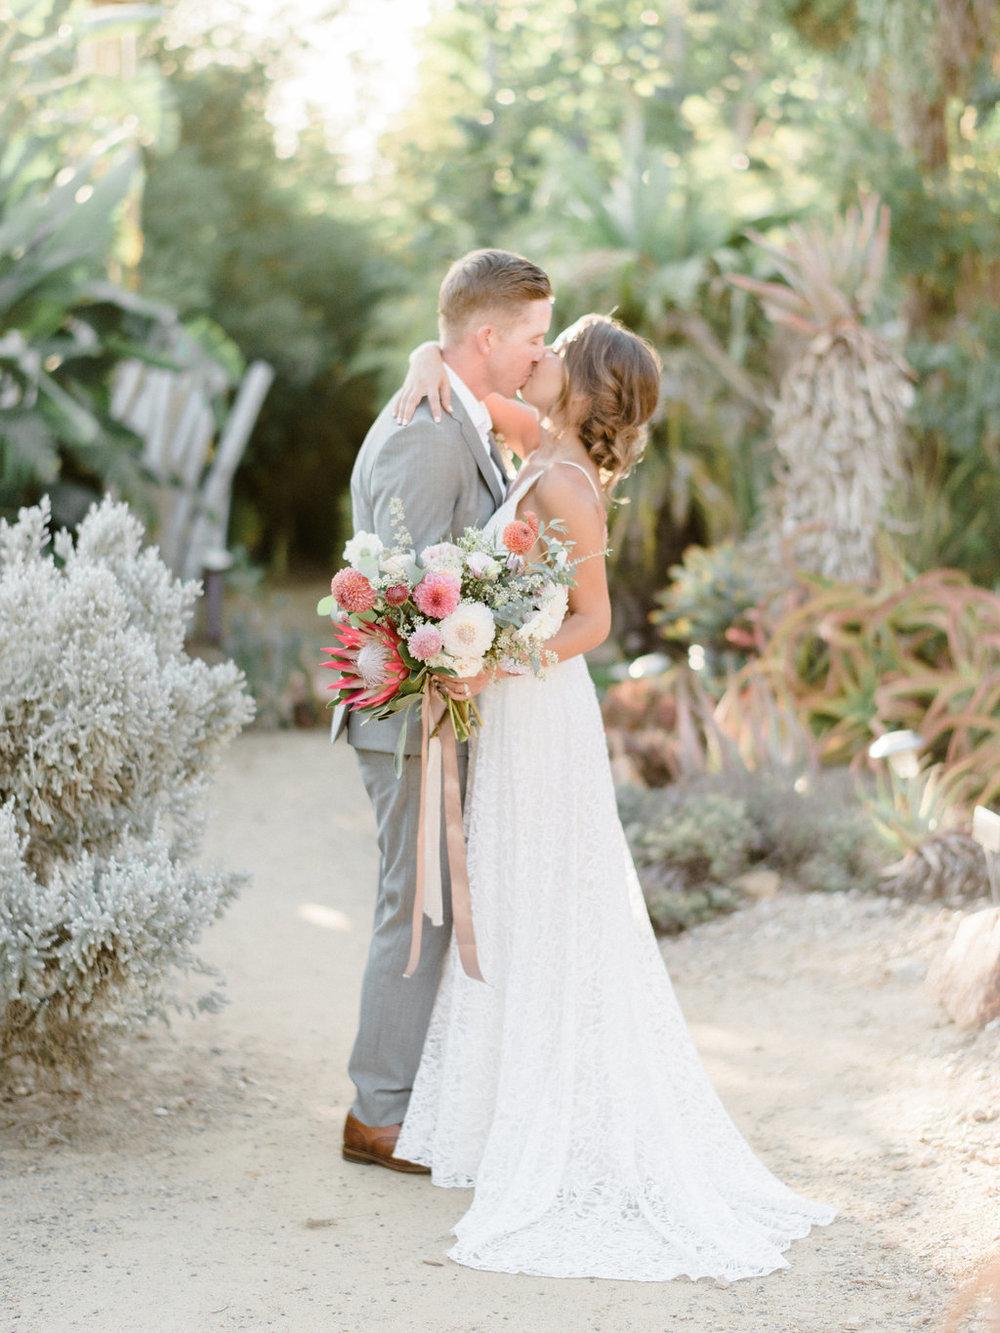 caitlynneandjoseph-wedding-665.jpg